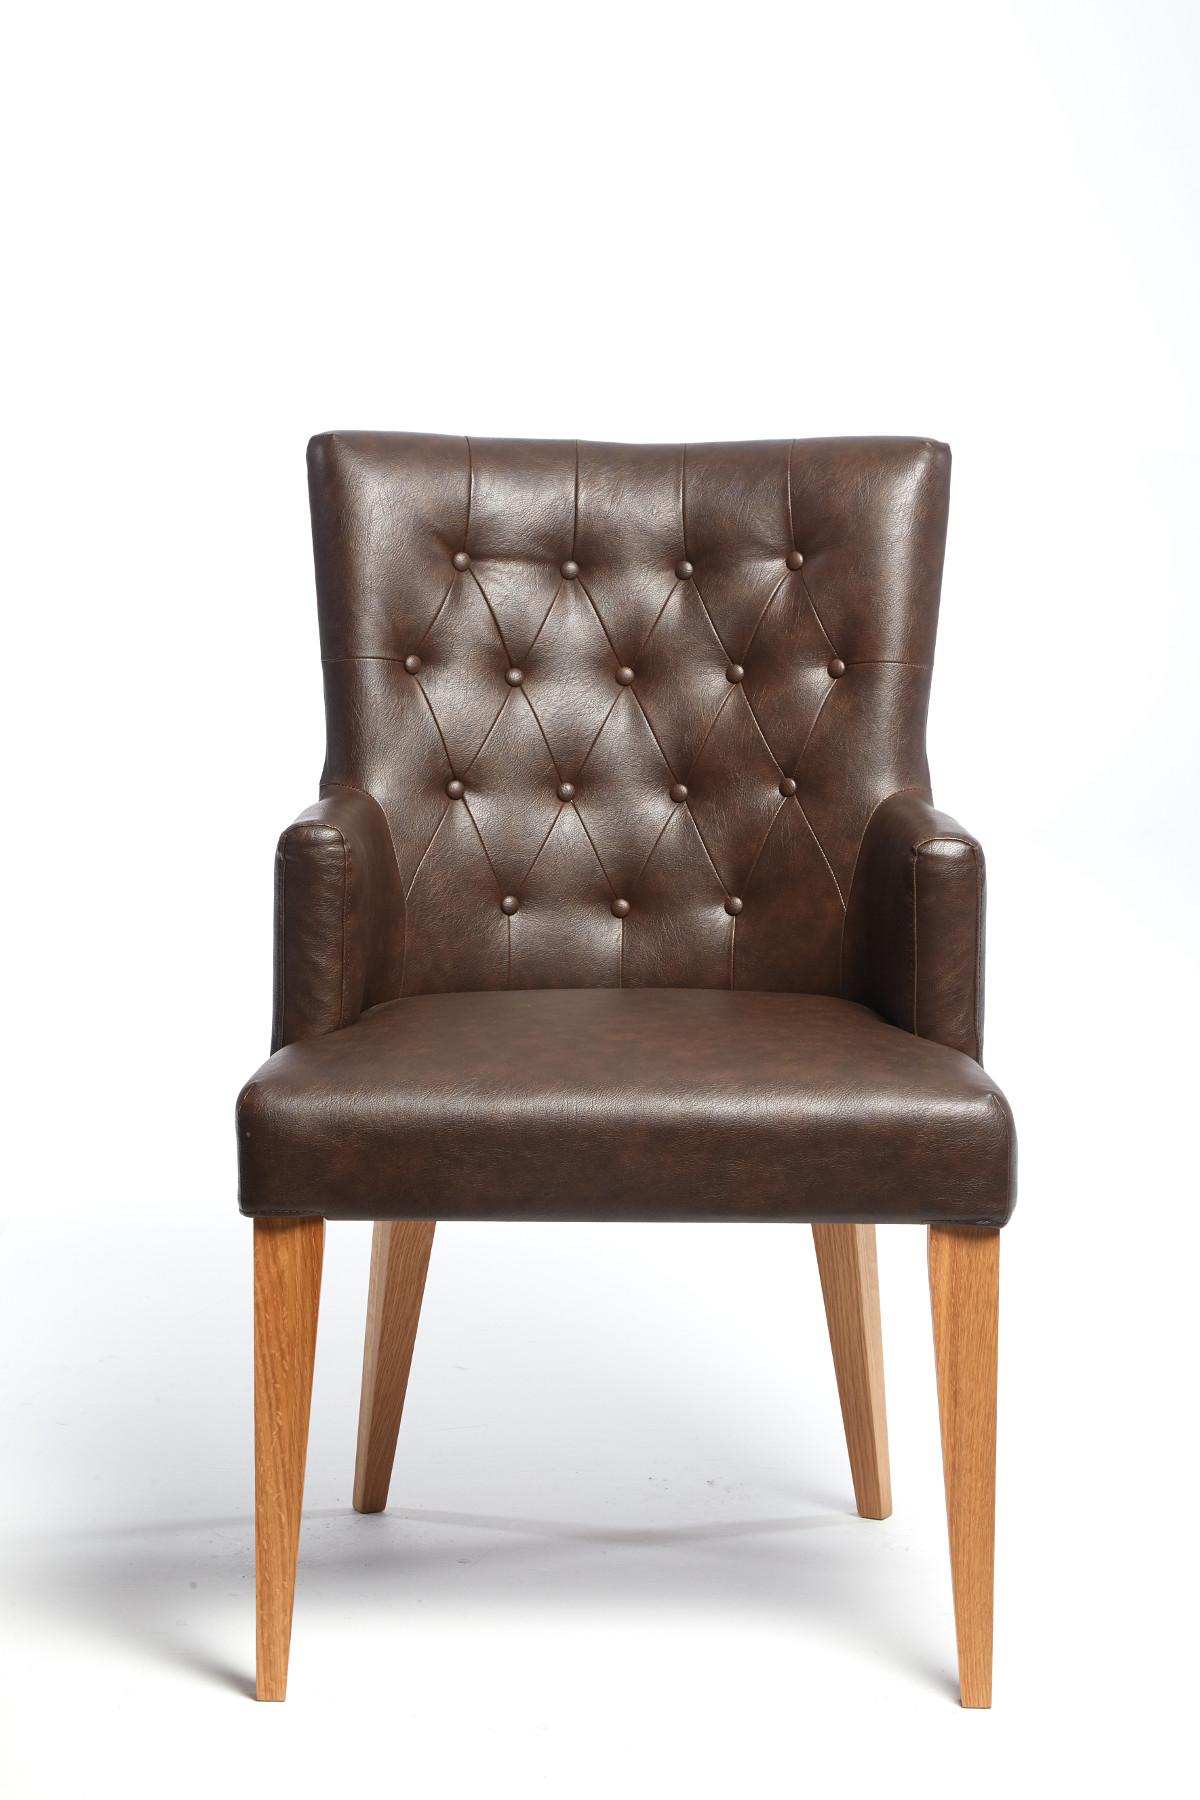 Salerno Bundle (Salerno Extending Table & 6 Salerno Dining Chairs) - OUTLET